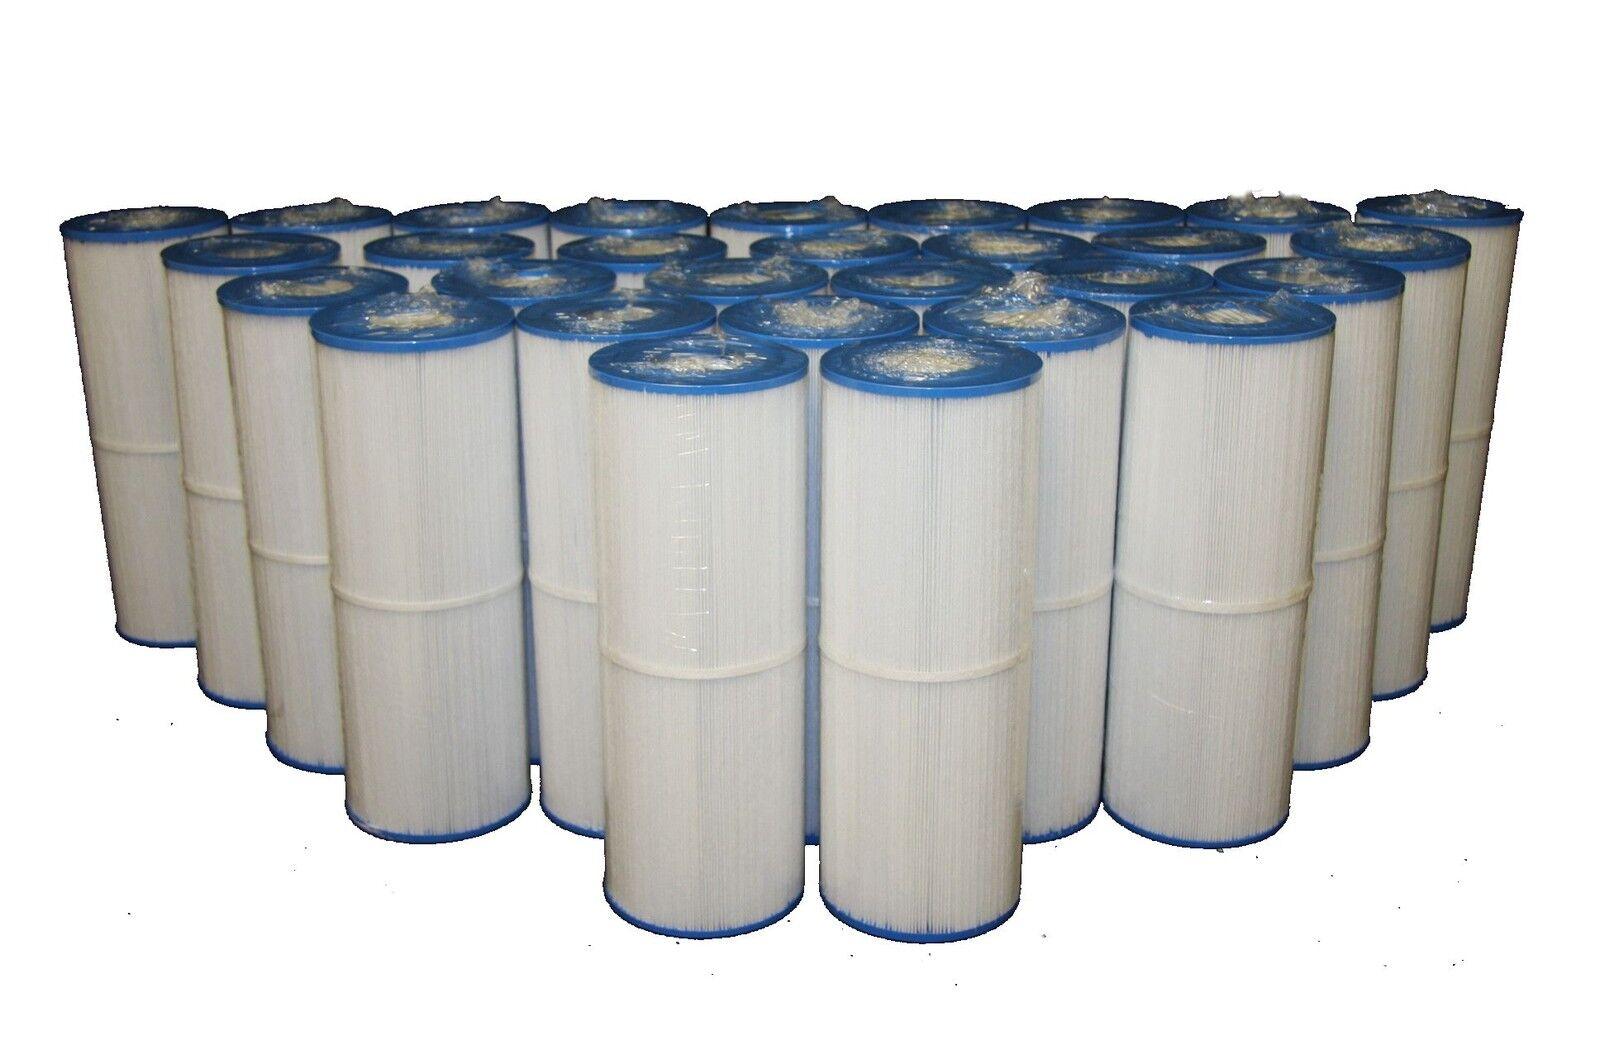 Filterdeal Outlet